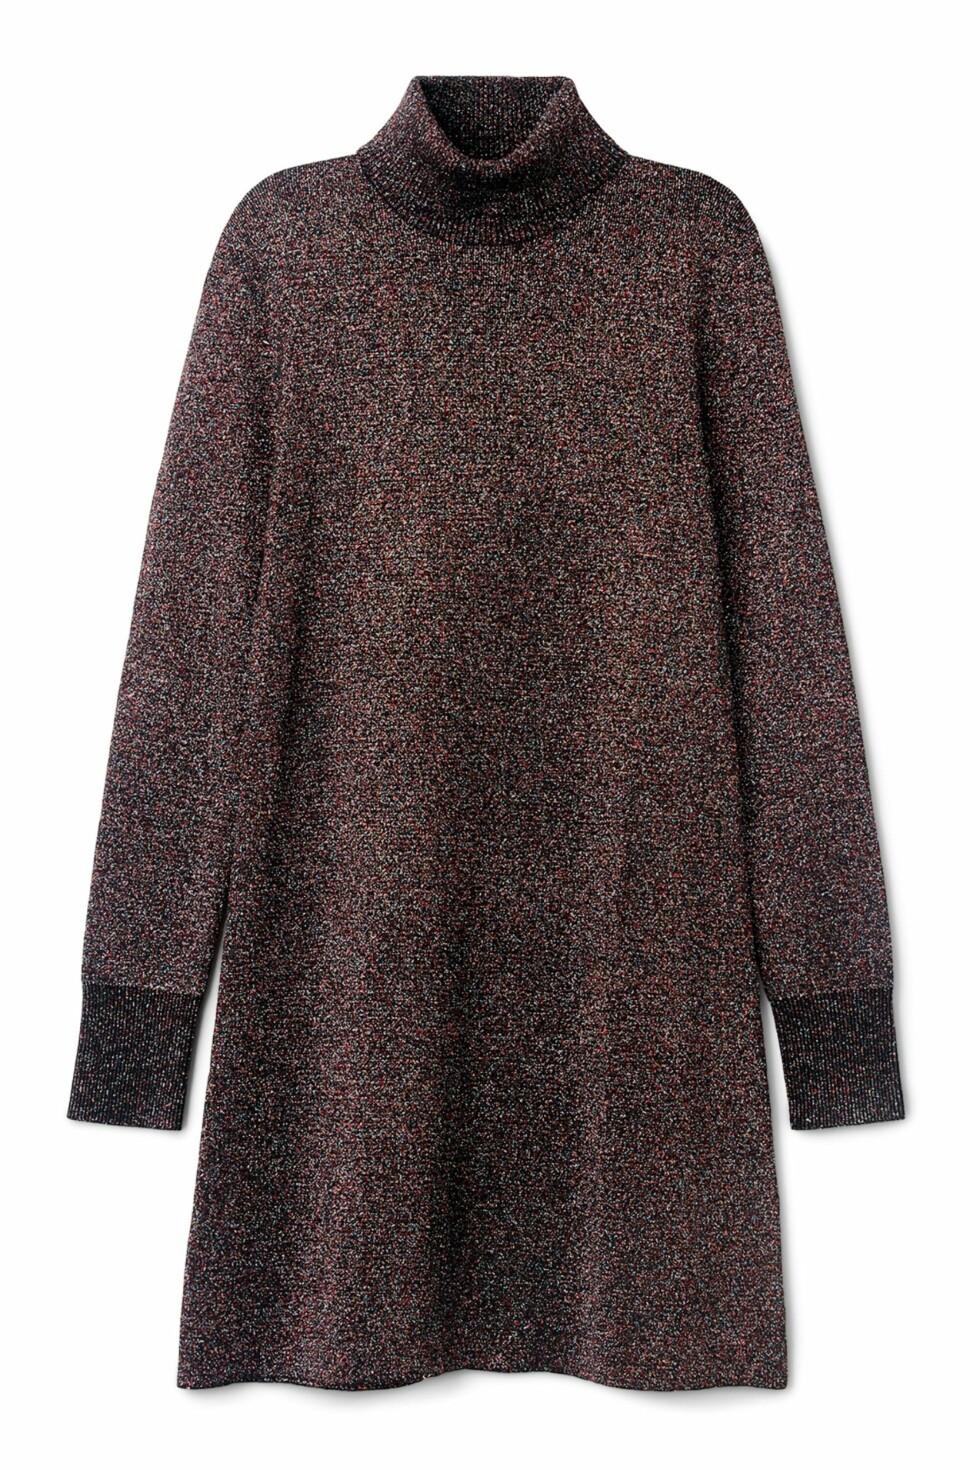 <strong>Kjole fra Weekday   kr 600   http:</strong>//shop.weekday.com/se/Womens_shop/Dresses_Jumpsuits/Sparkle_Knit_Dress/542434-9946196.1#c-47958